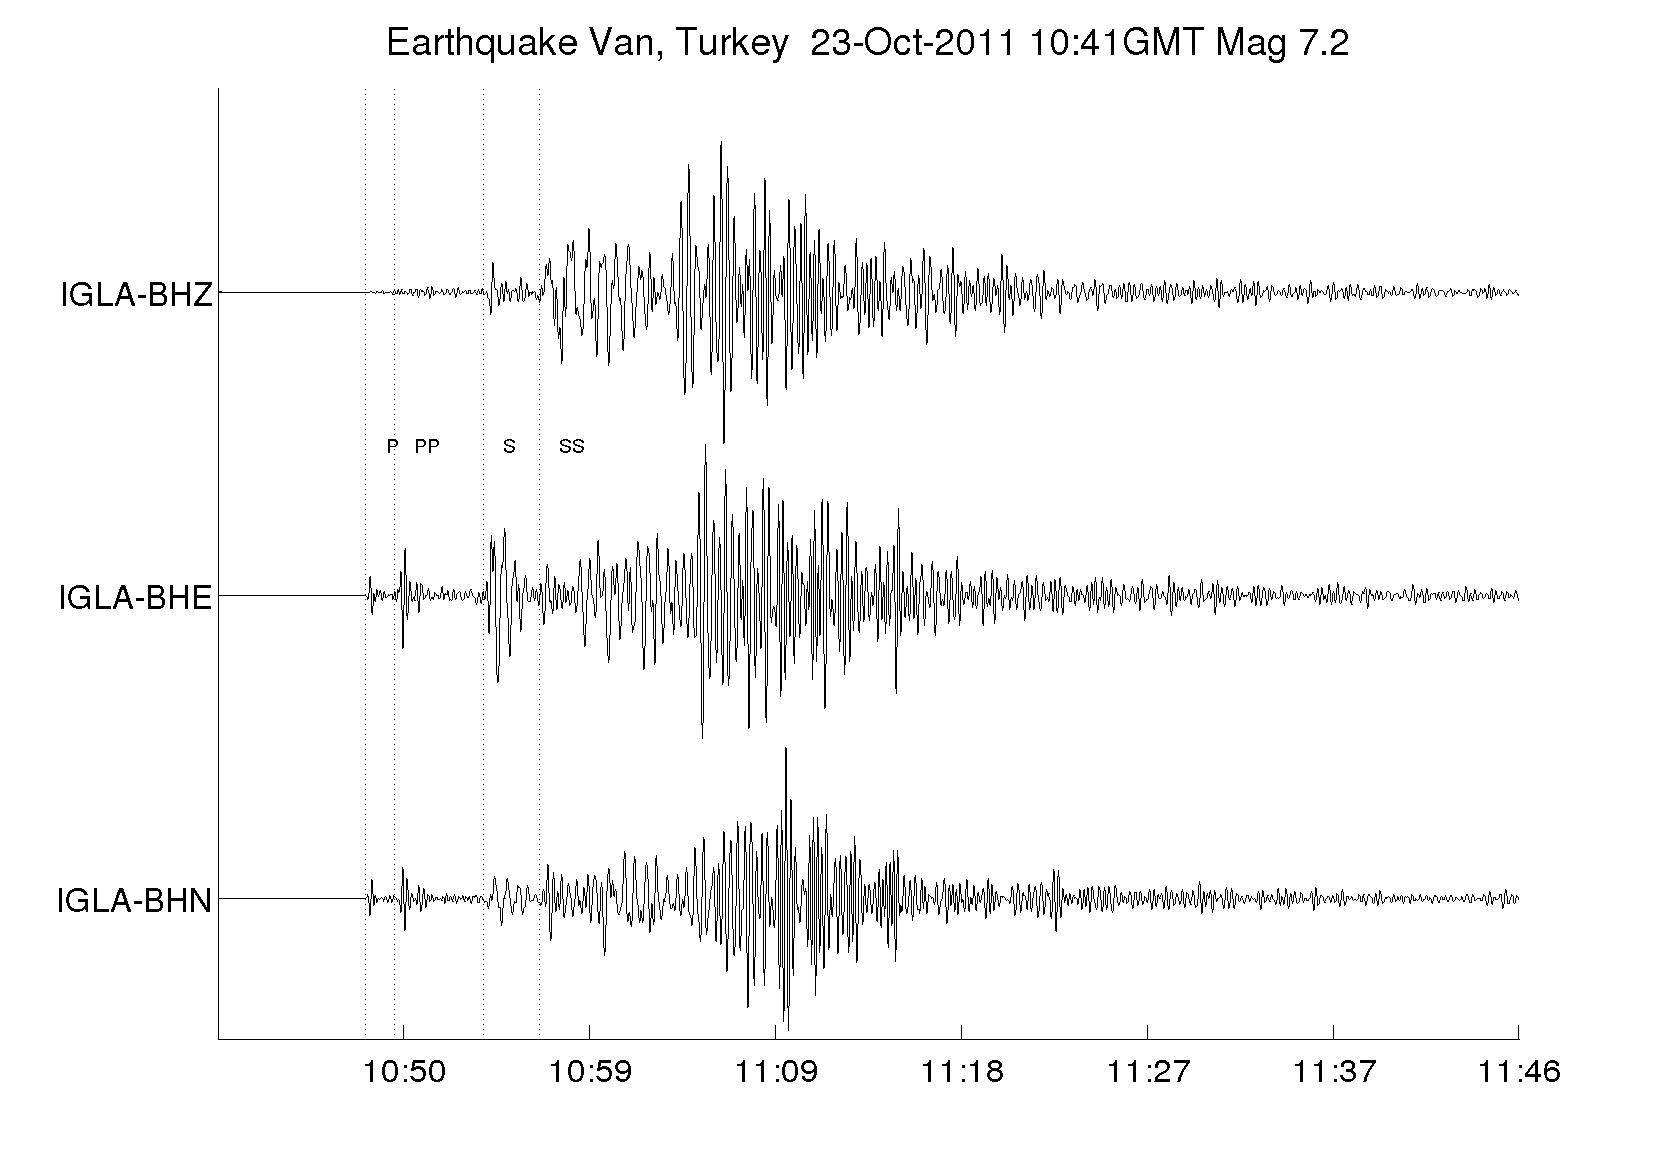 Turkey earthquake IGLA